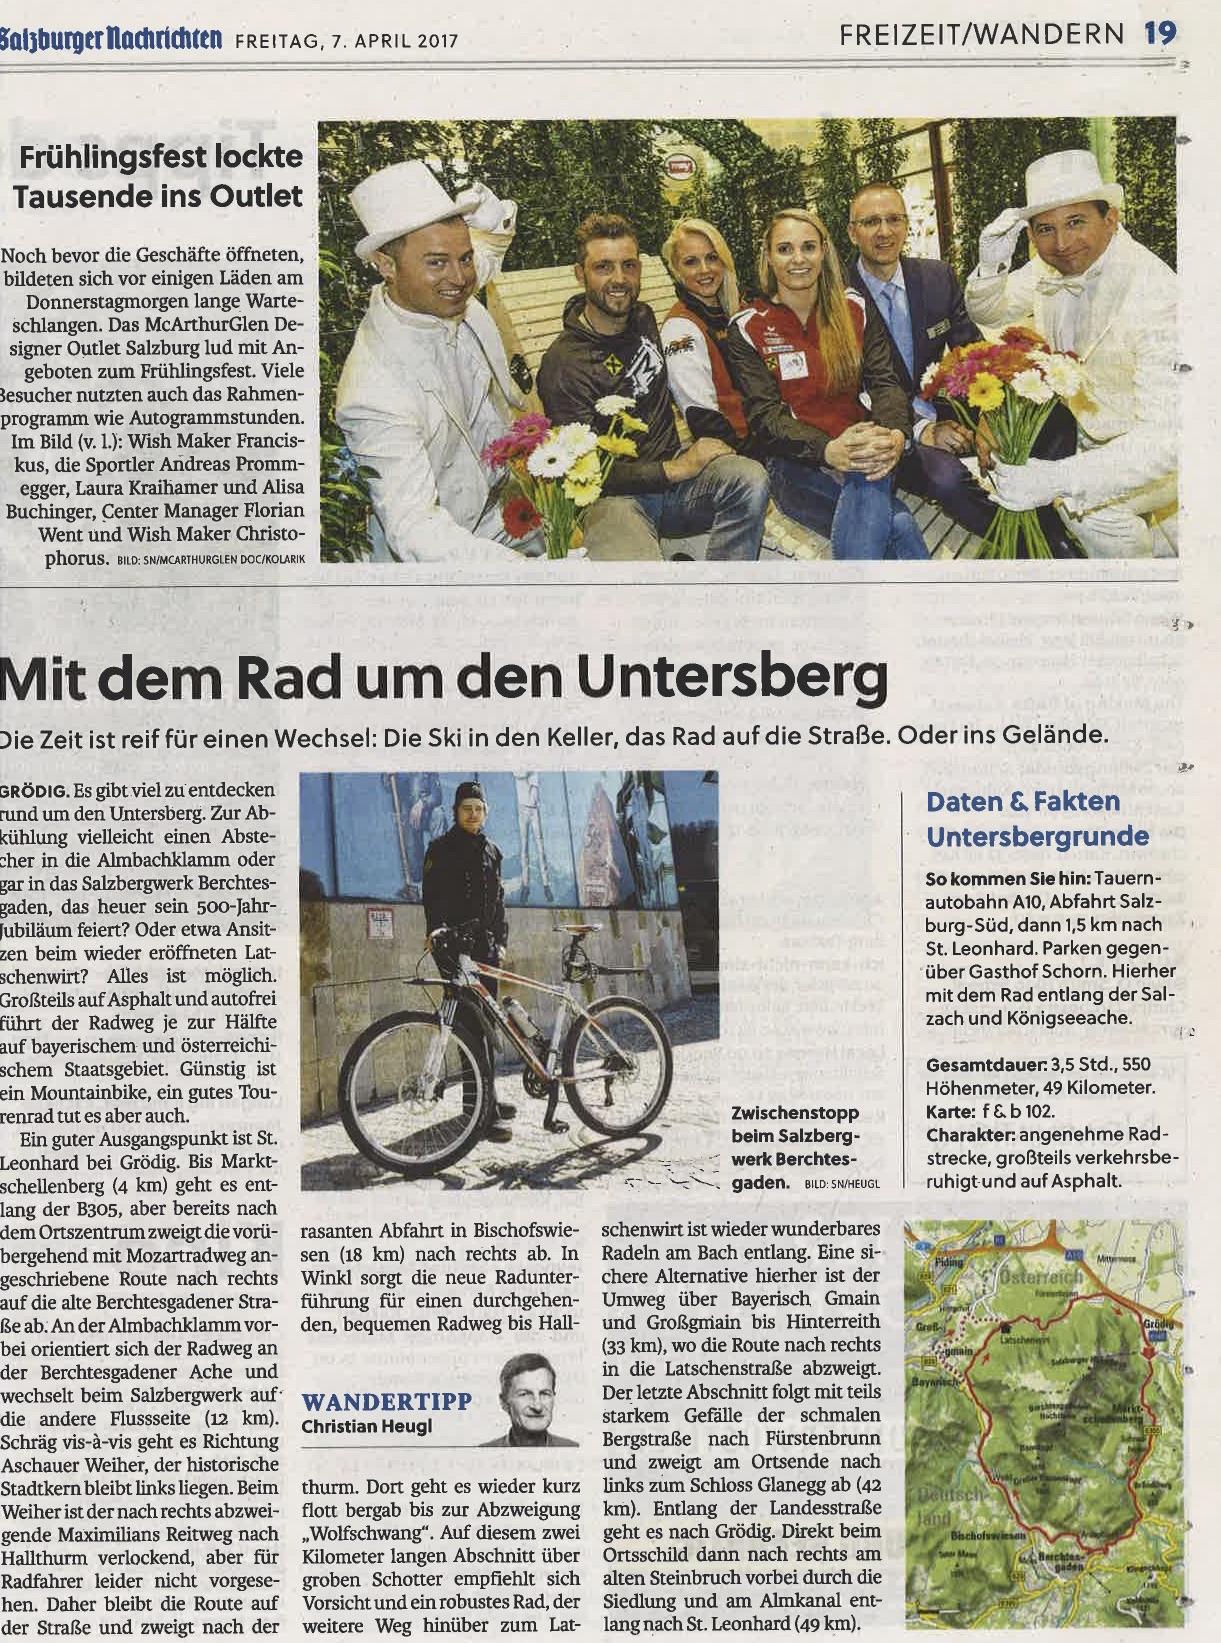 Salzburger Nachrichten, 7. April 2017